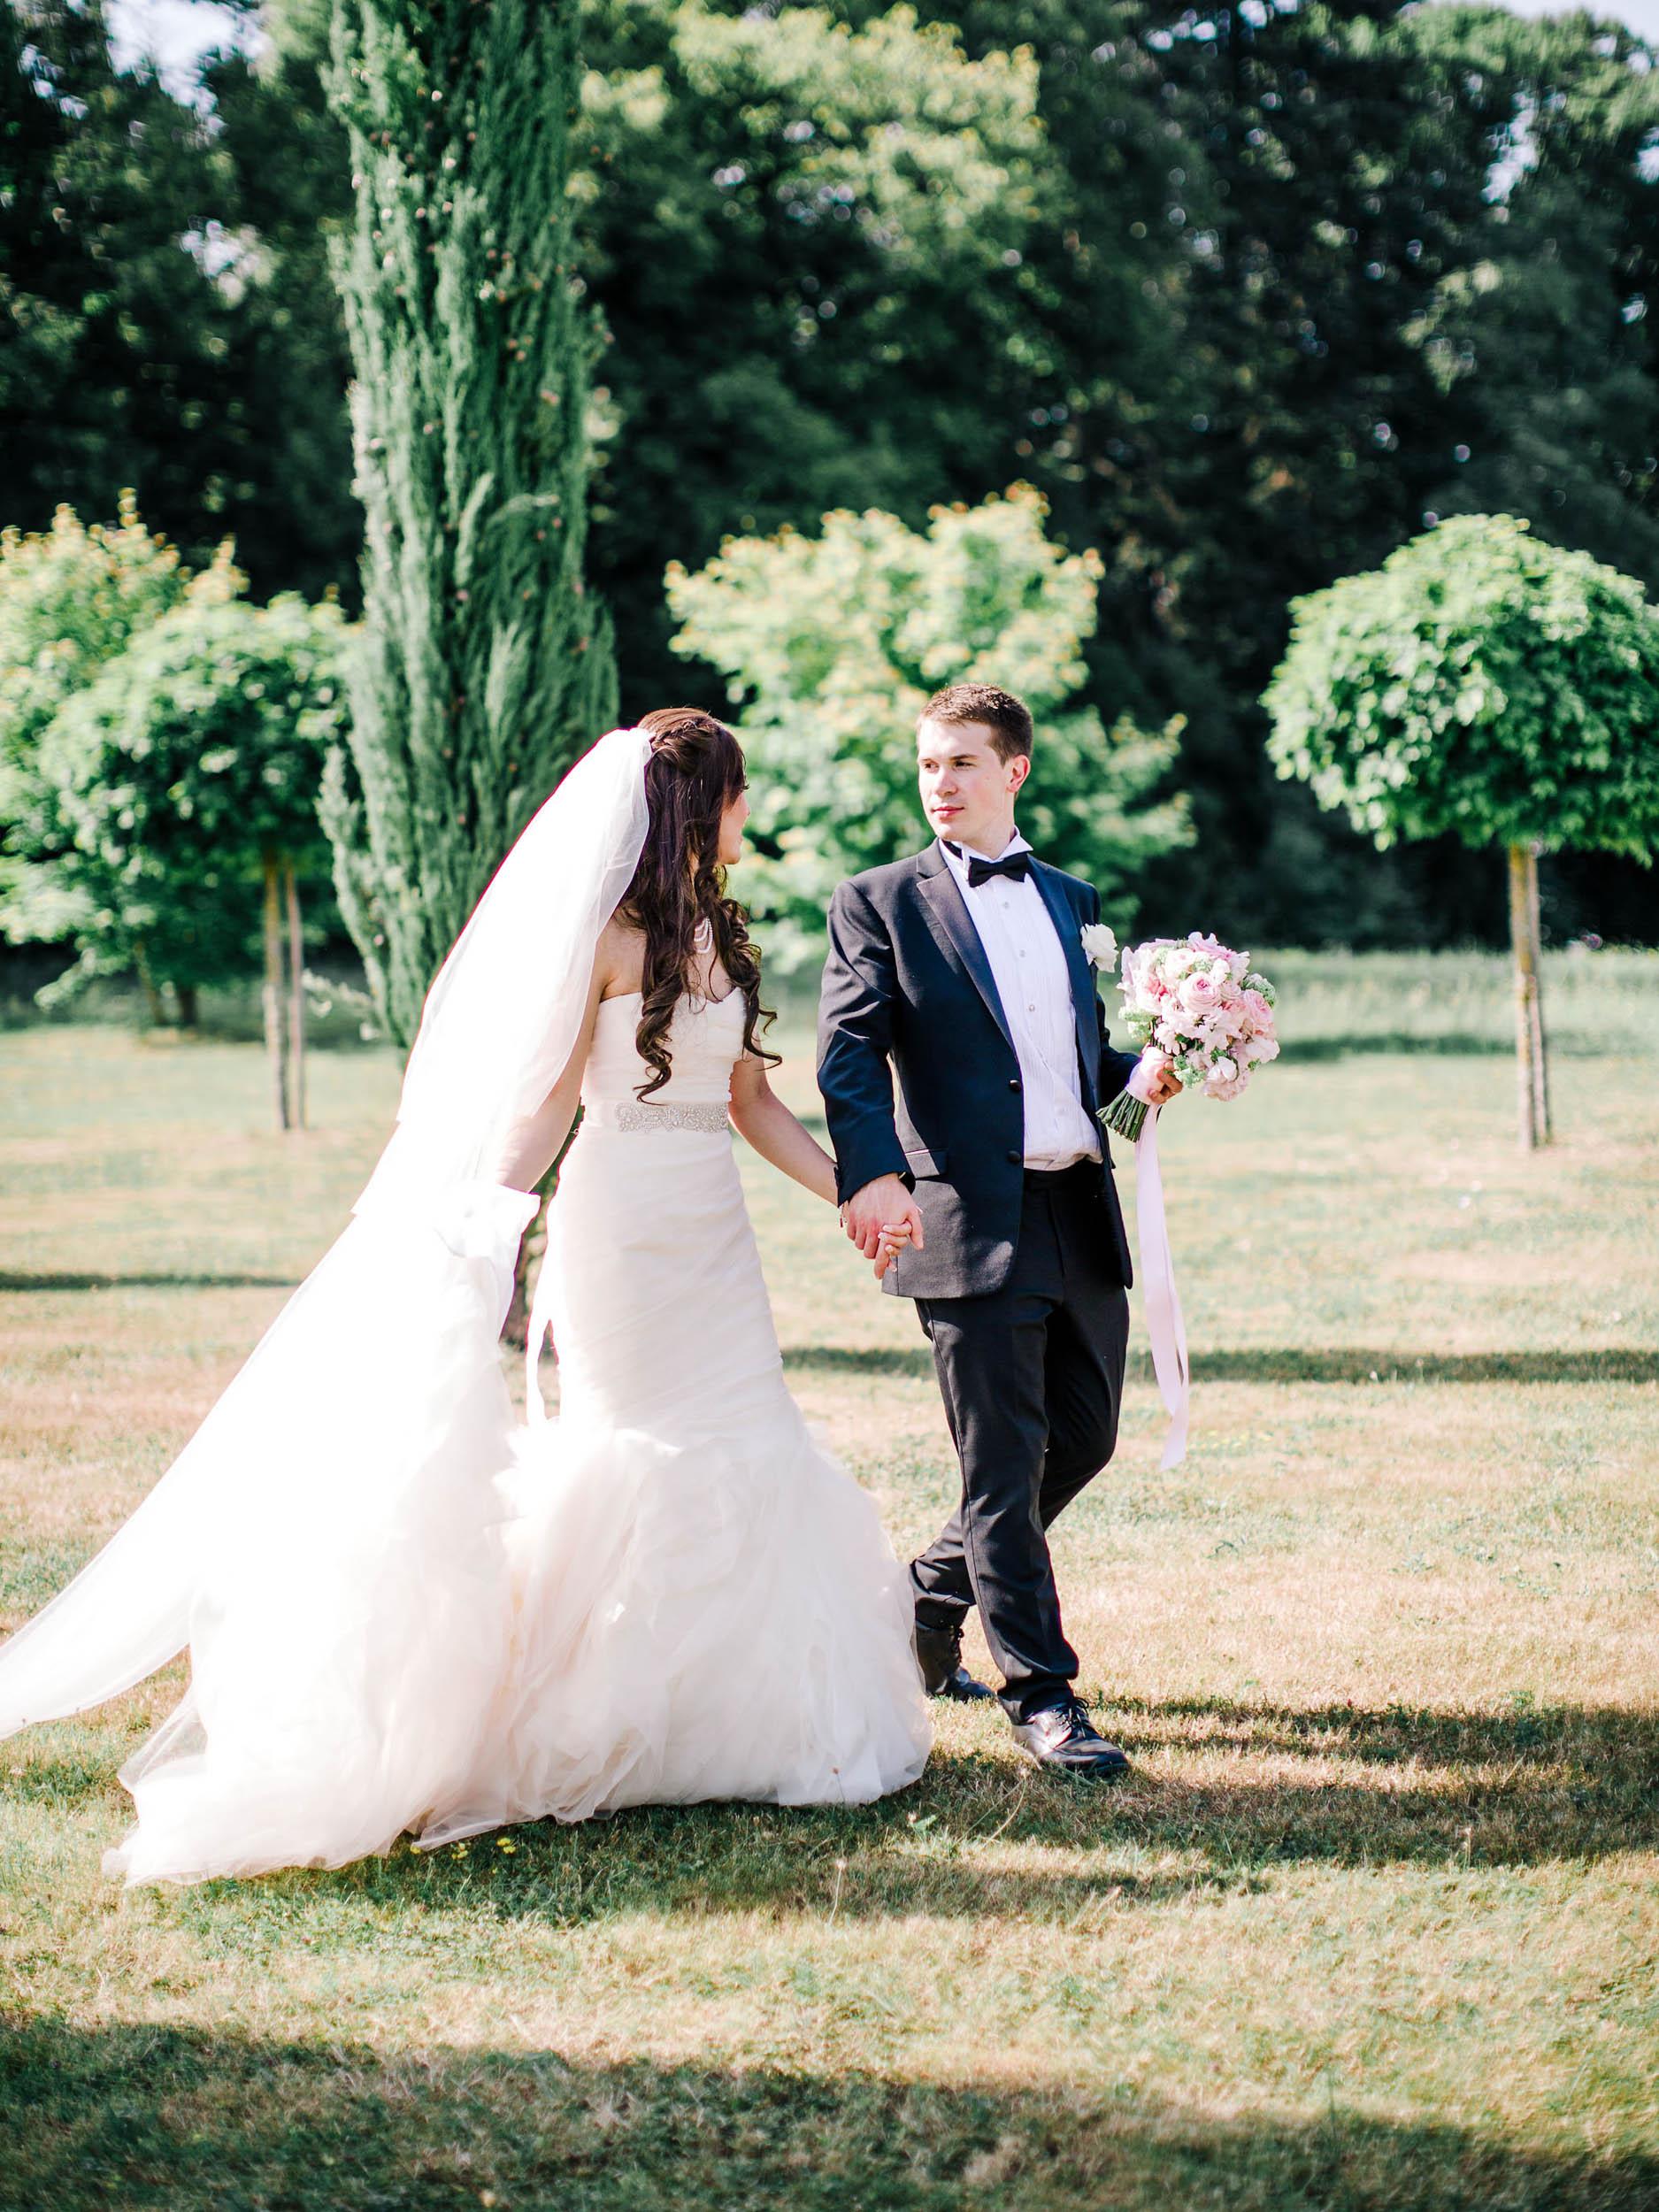 Amy O'Boyle Photography- Destination & UK Fine Art Film Wedding Photographer- Chateau La Durantie Wedding-28.jpg